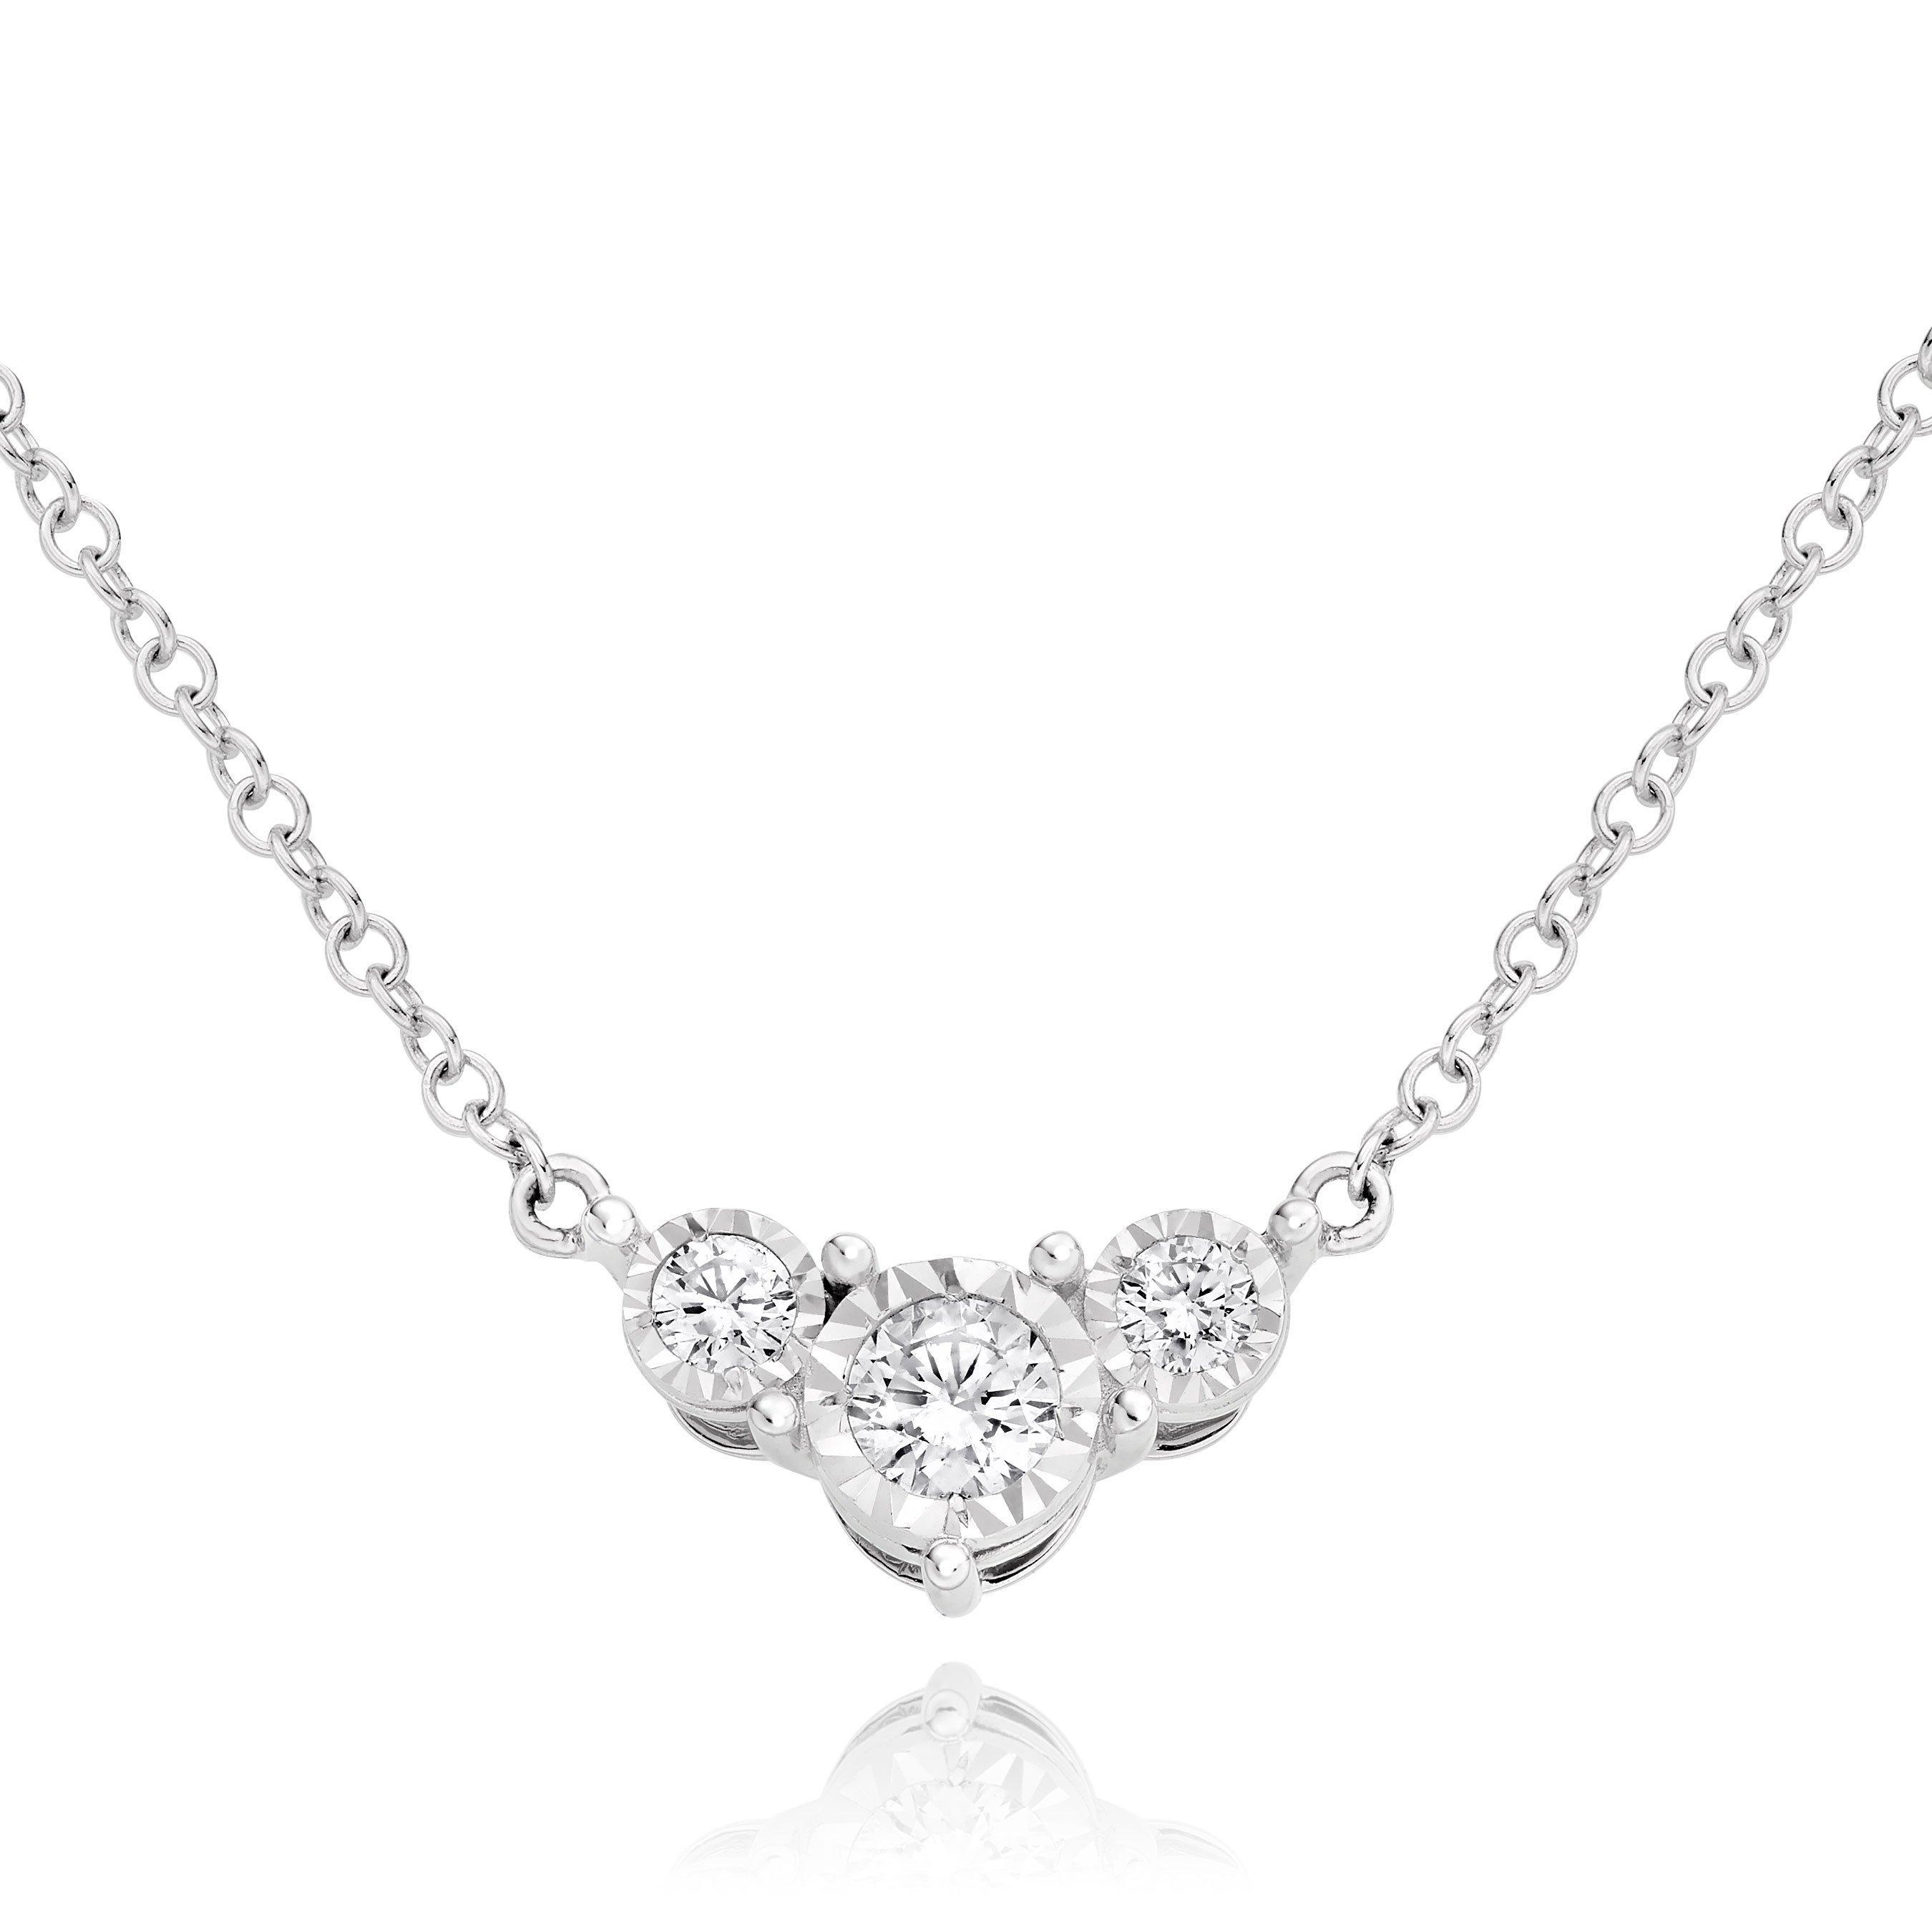 9ct White Gold Diamond Illusion Necklace